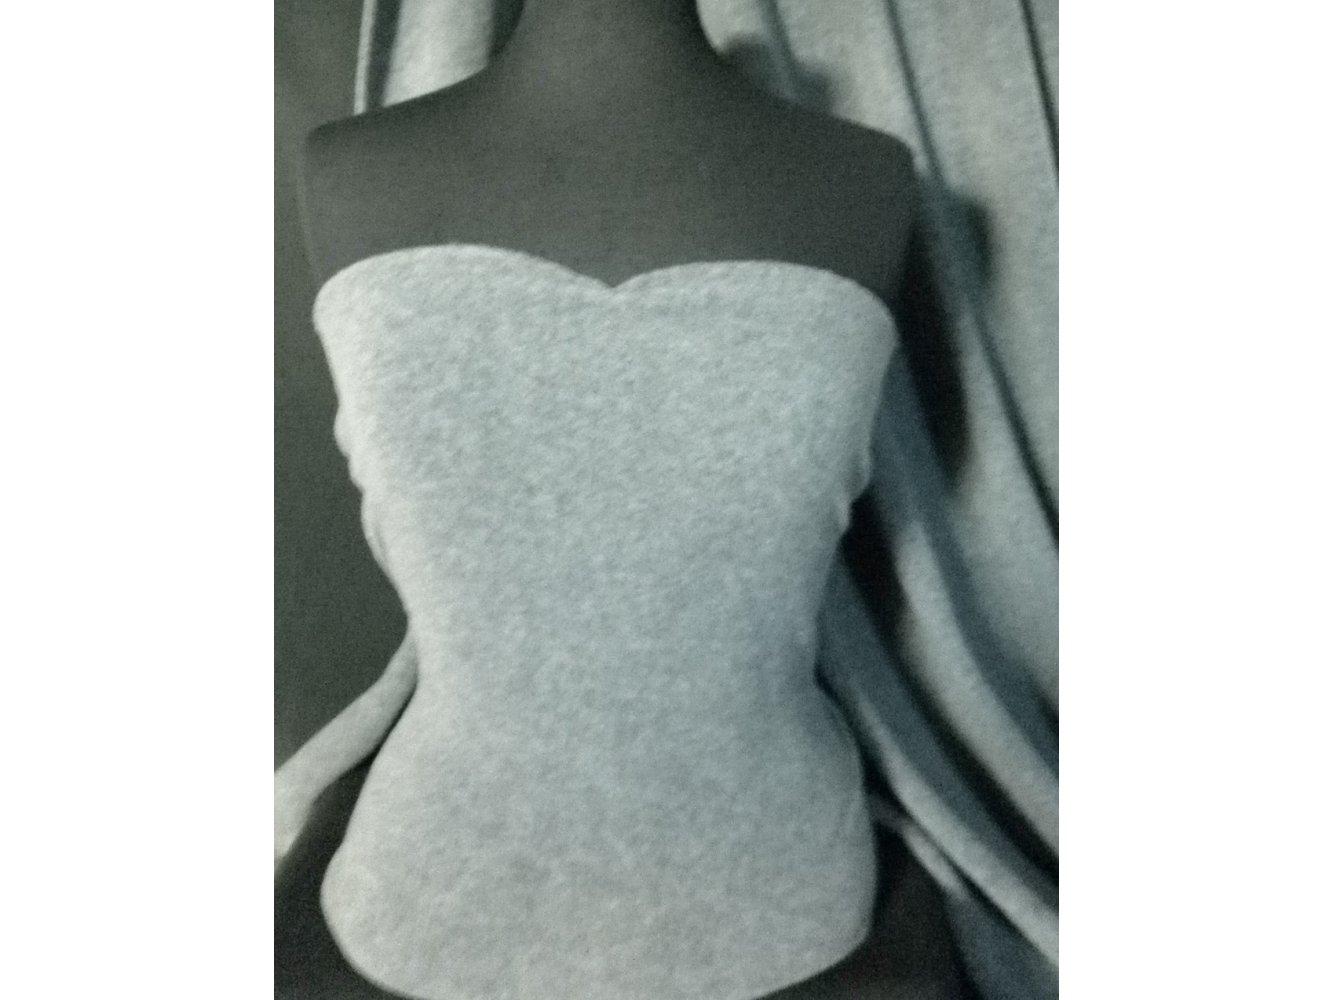 Polar Fleece Anti Pill Washable Soft Fabric- Khaki PF KH